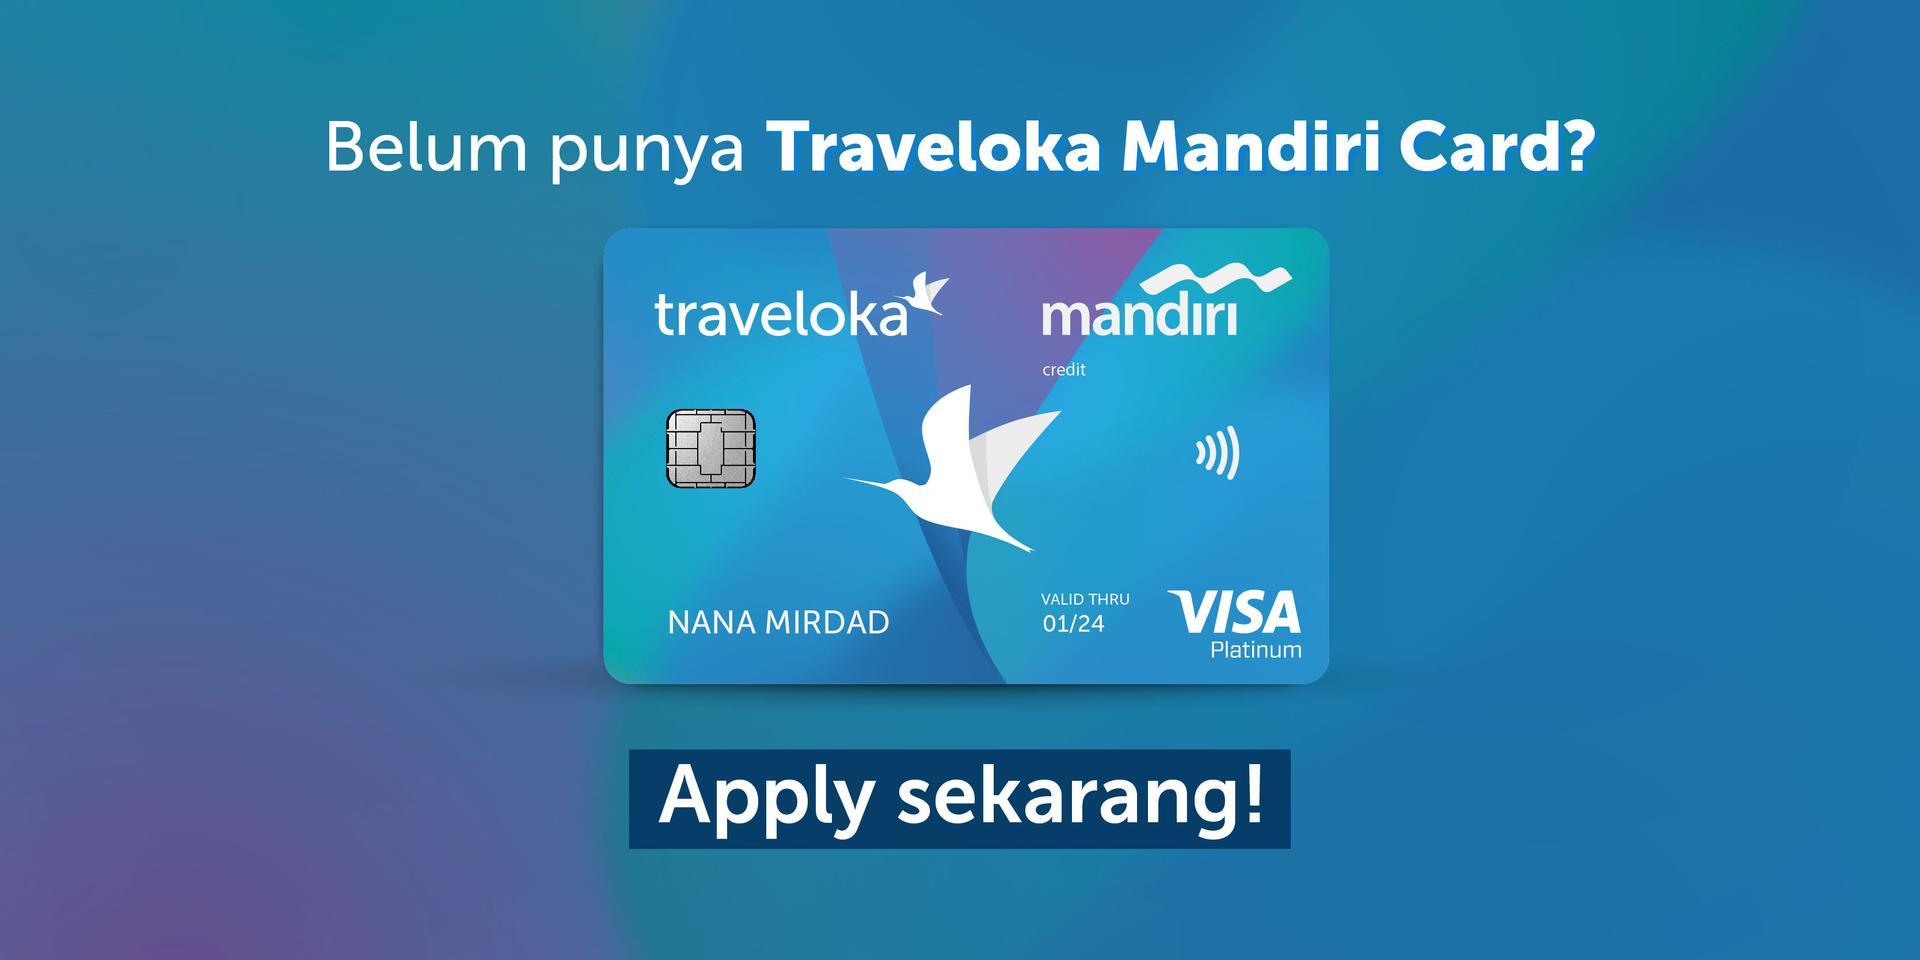 Promo Traveloka Mandiri Card